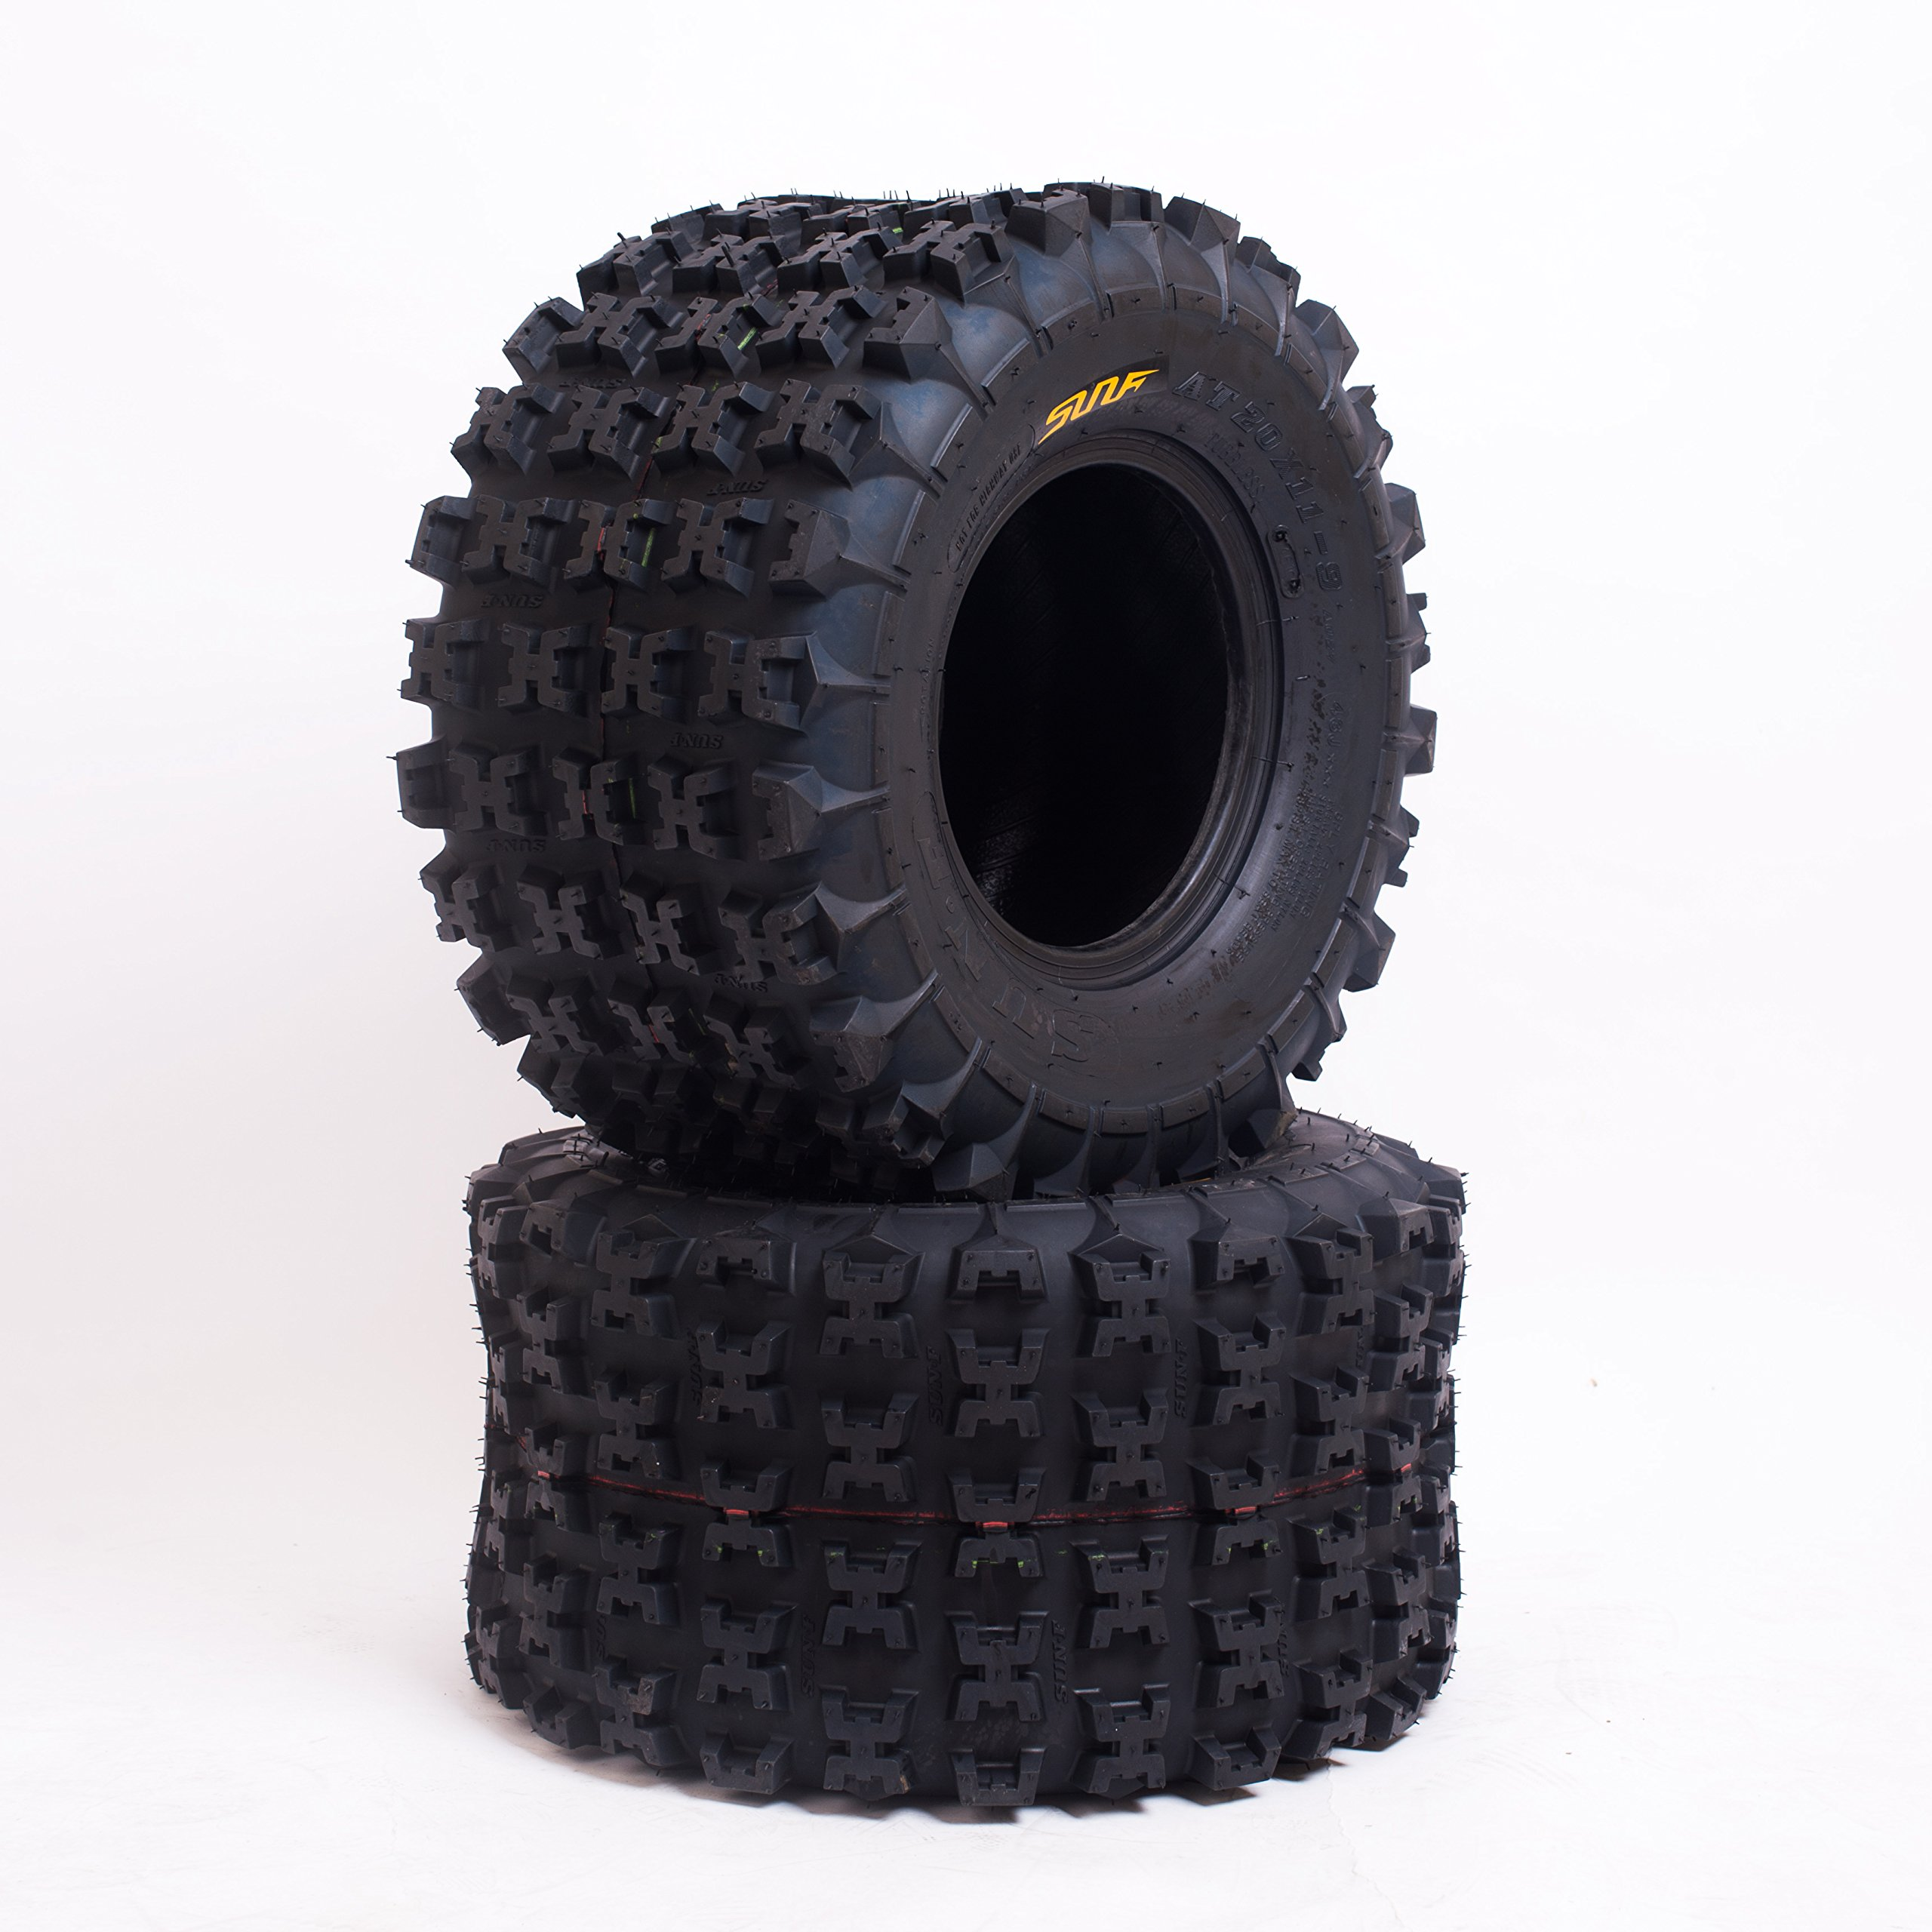 Set of 2 SunF A027 ATV Tire 22x11-9 Rear, 6 Ply by SunF (Image #2)